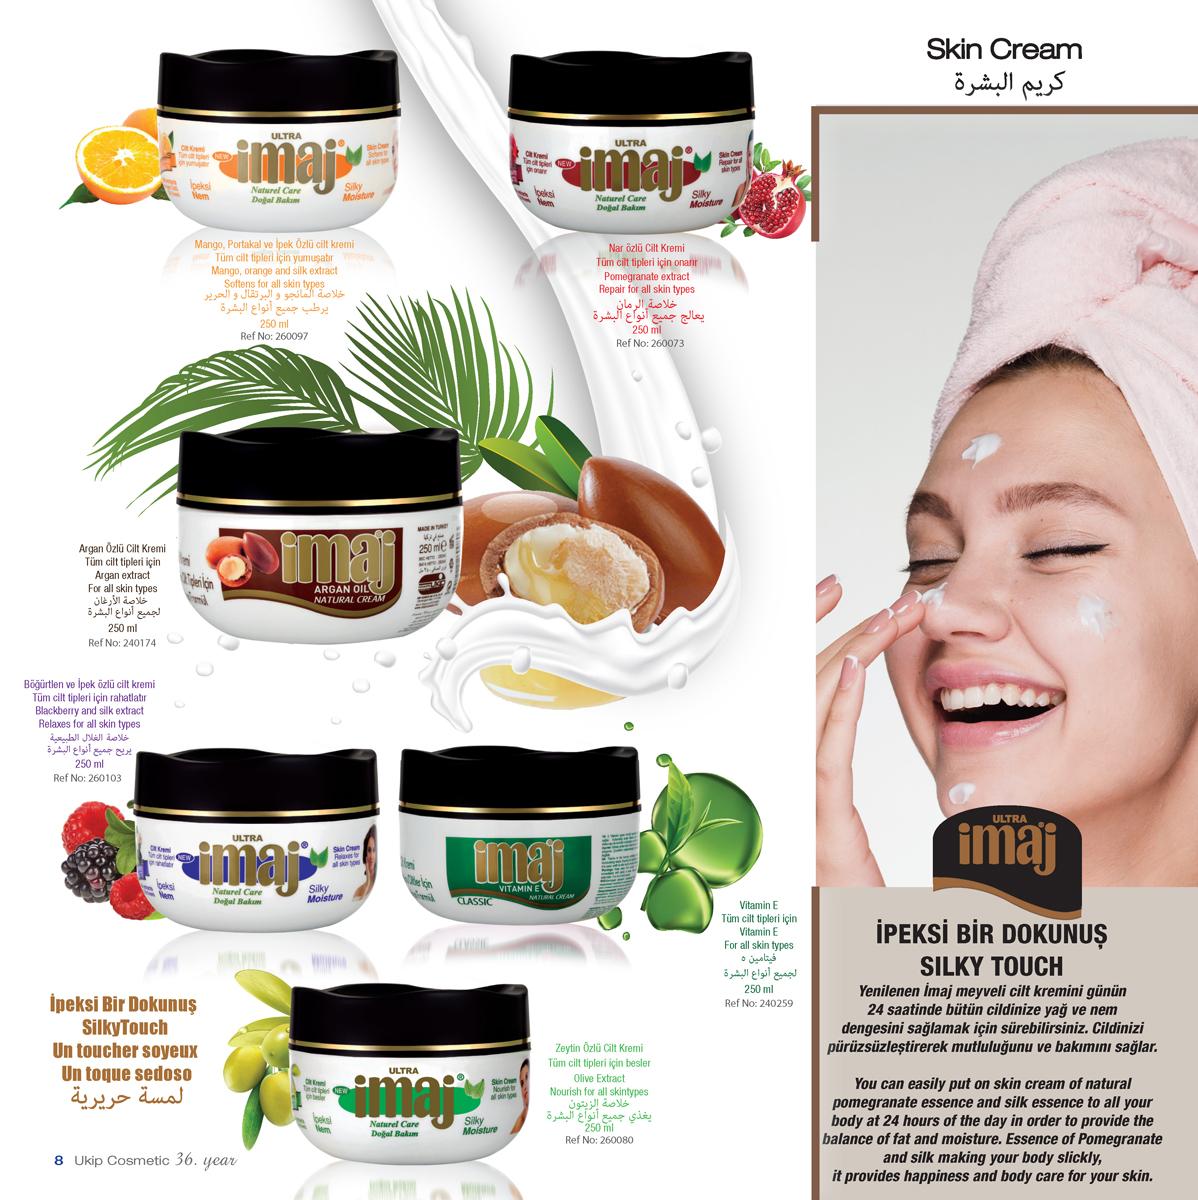 Imaj Skin Cream